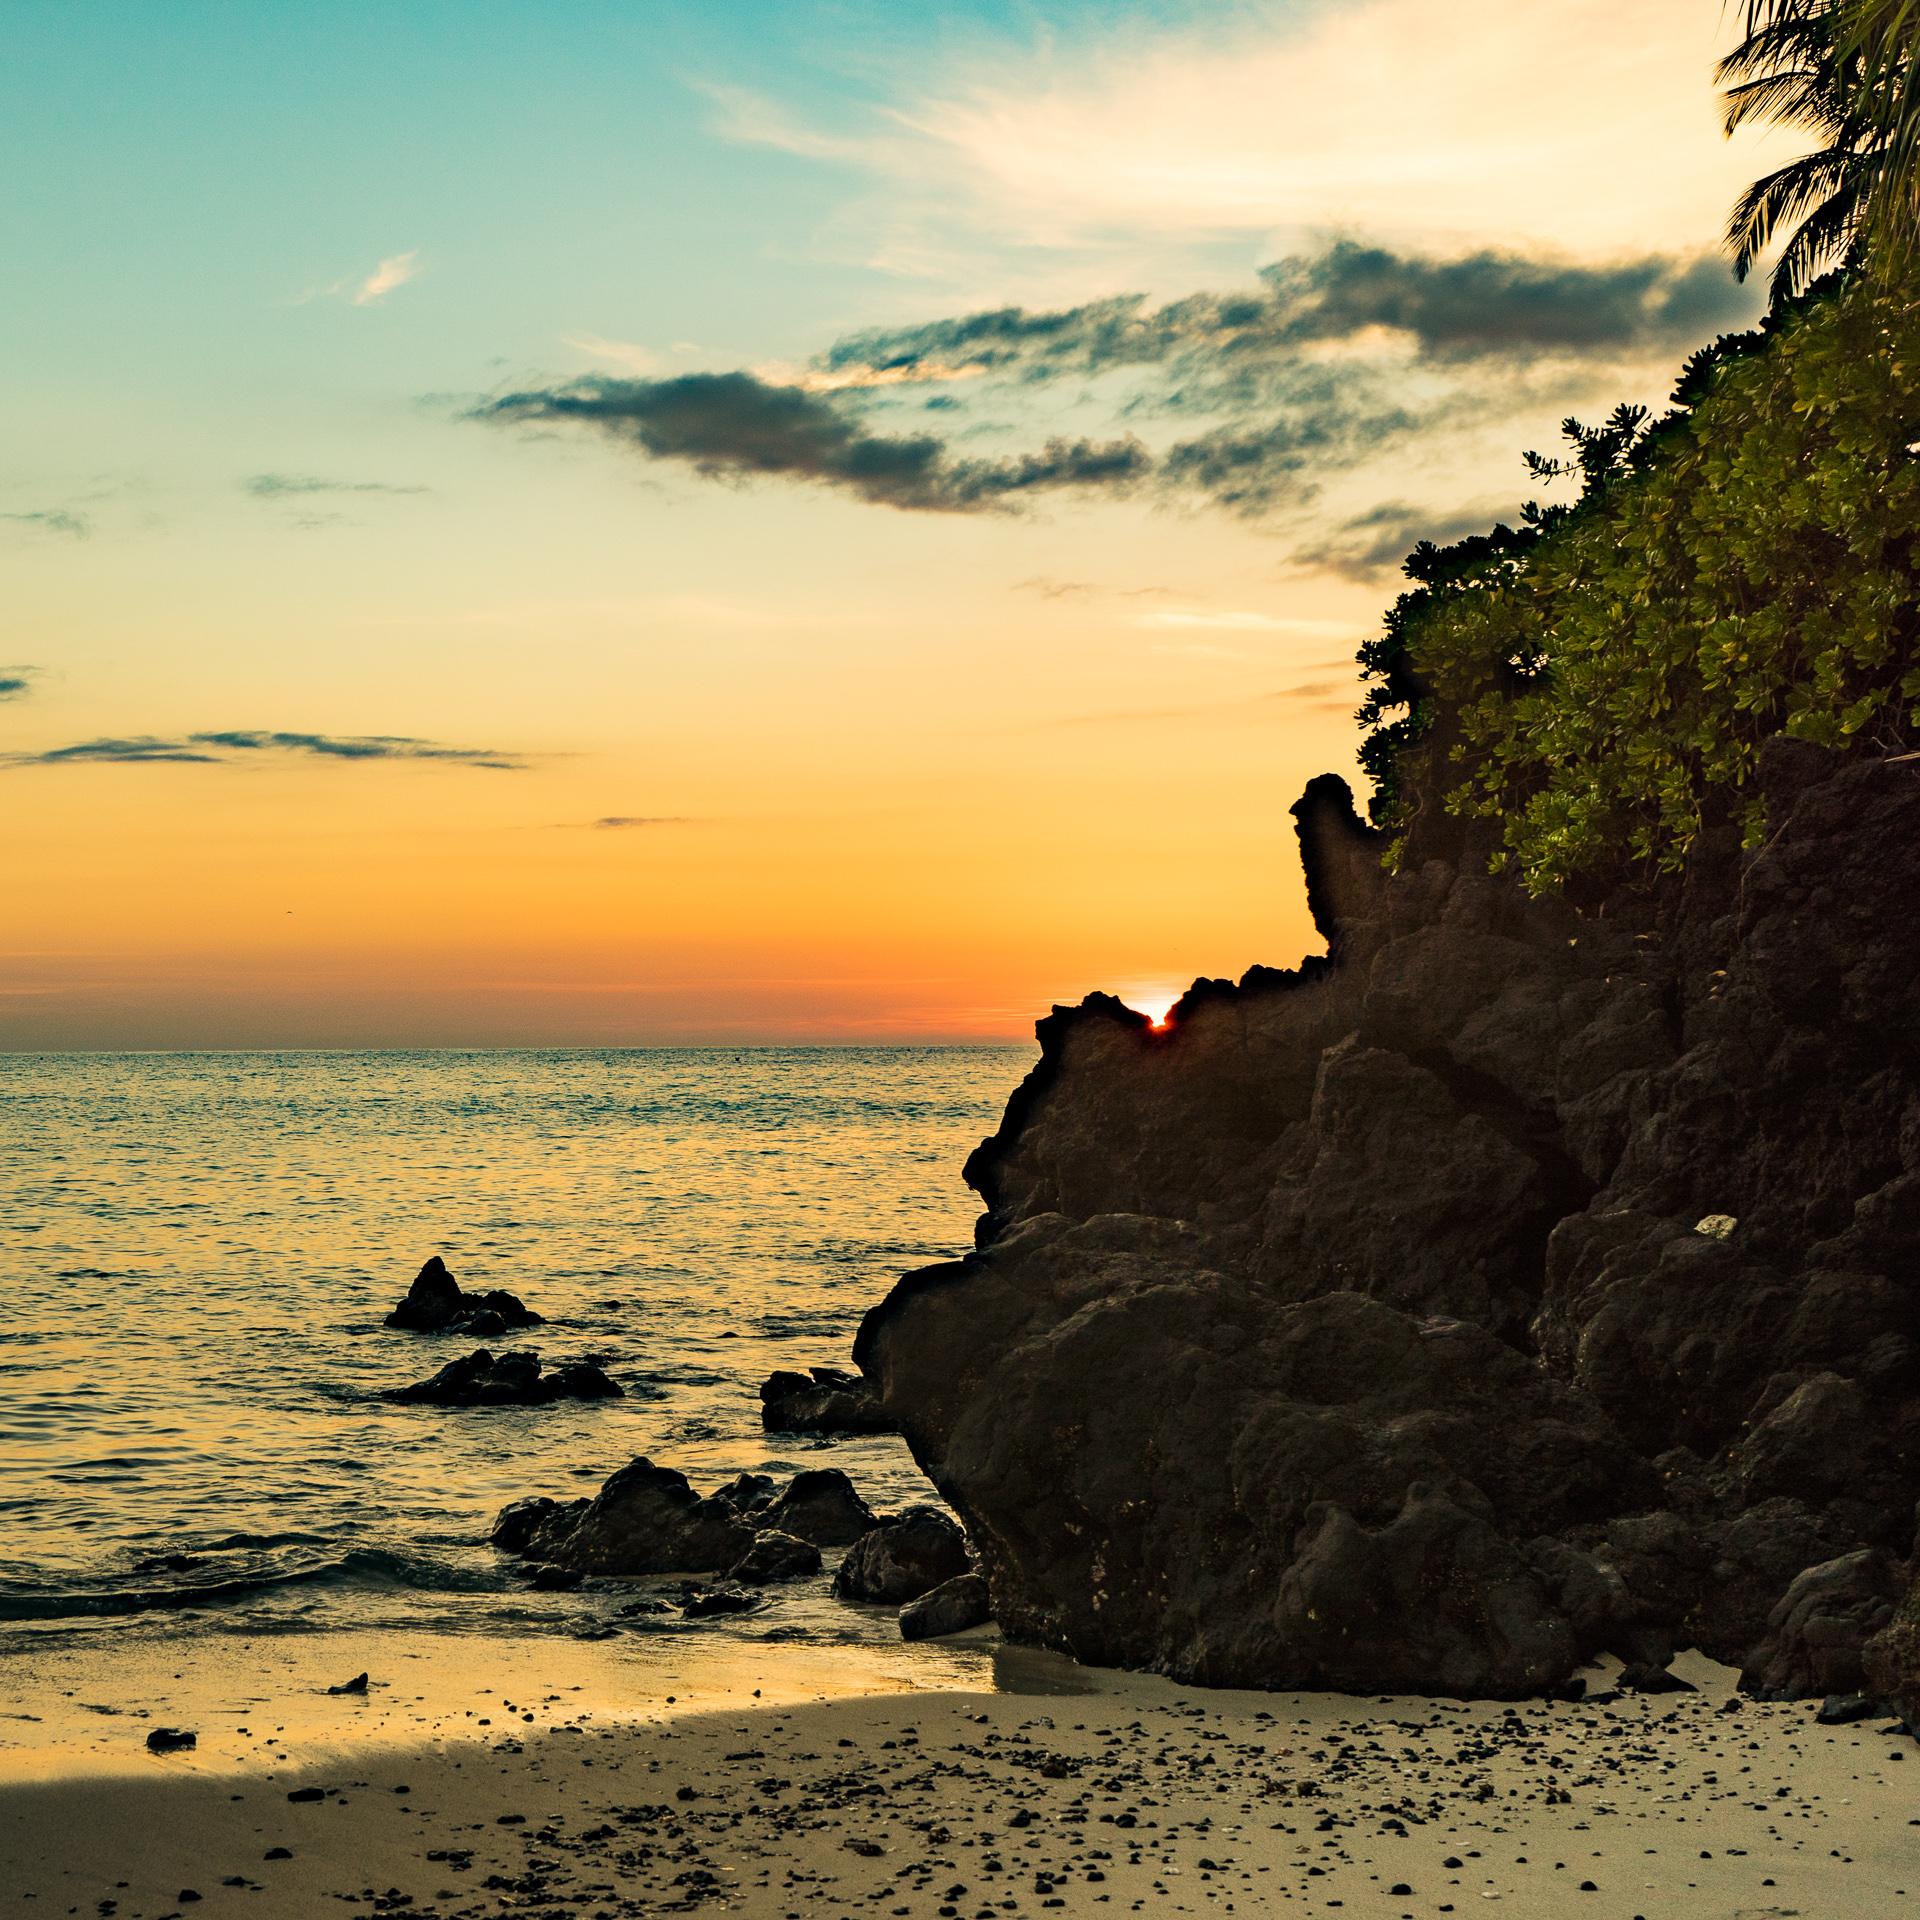 Itsandra Beach, Comoros